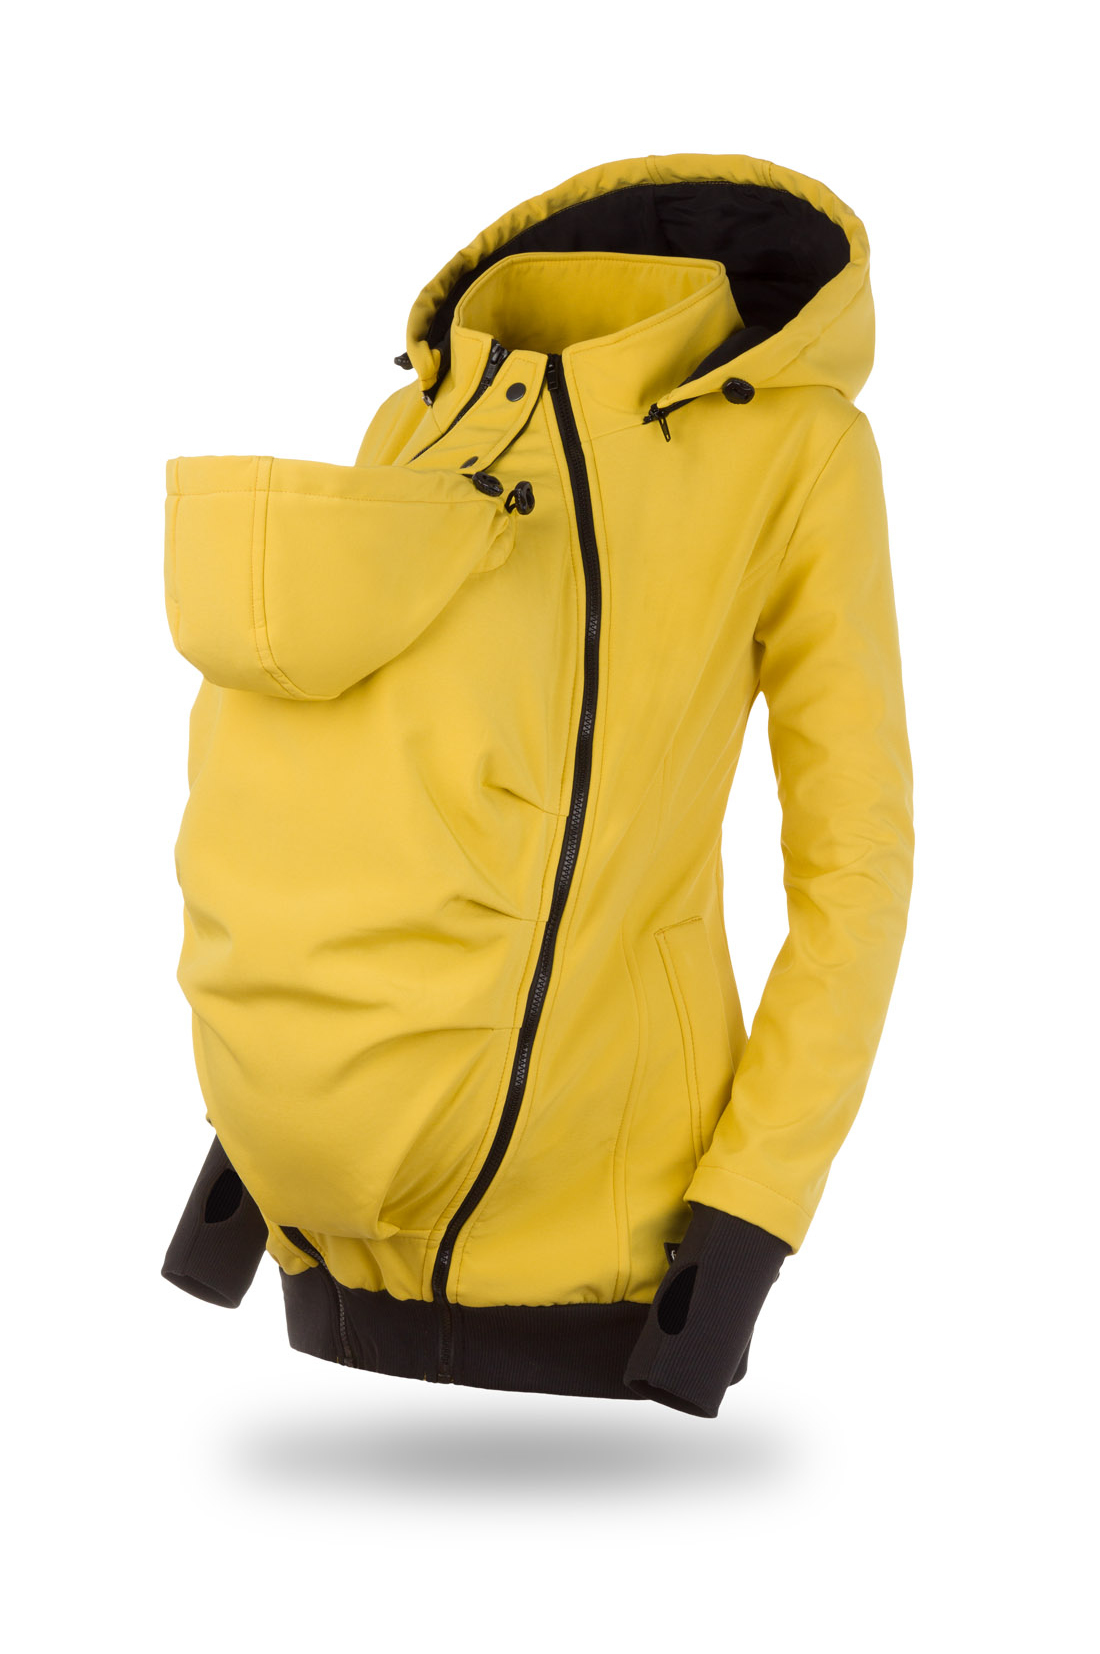 Everest mustard softshell positie- en draagjas mawaho.nl